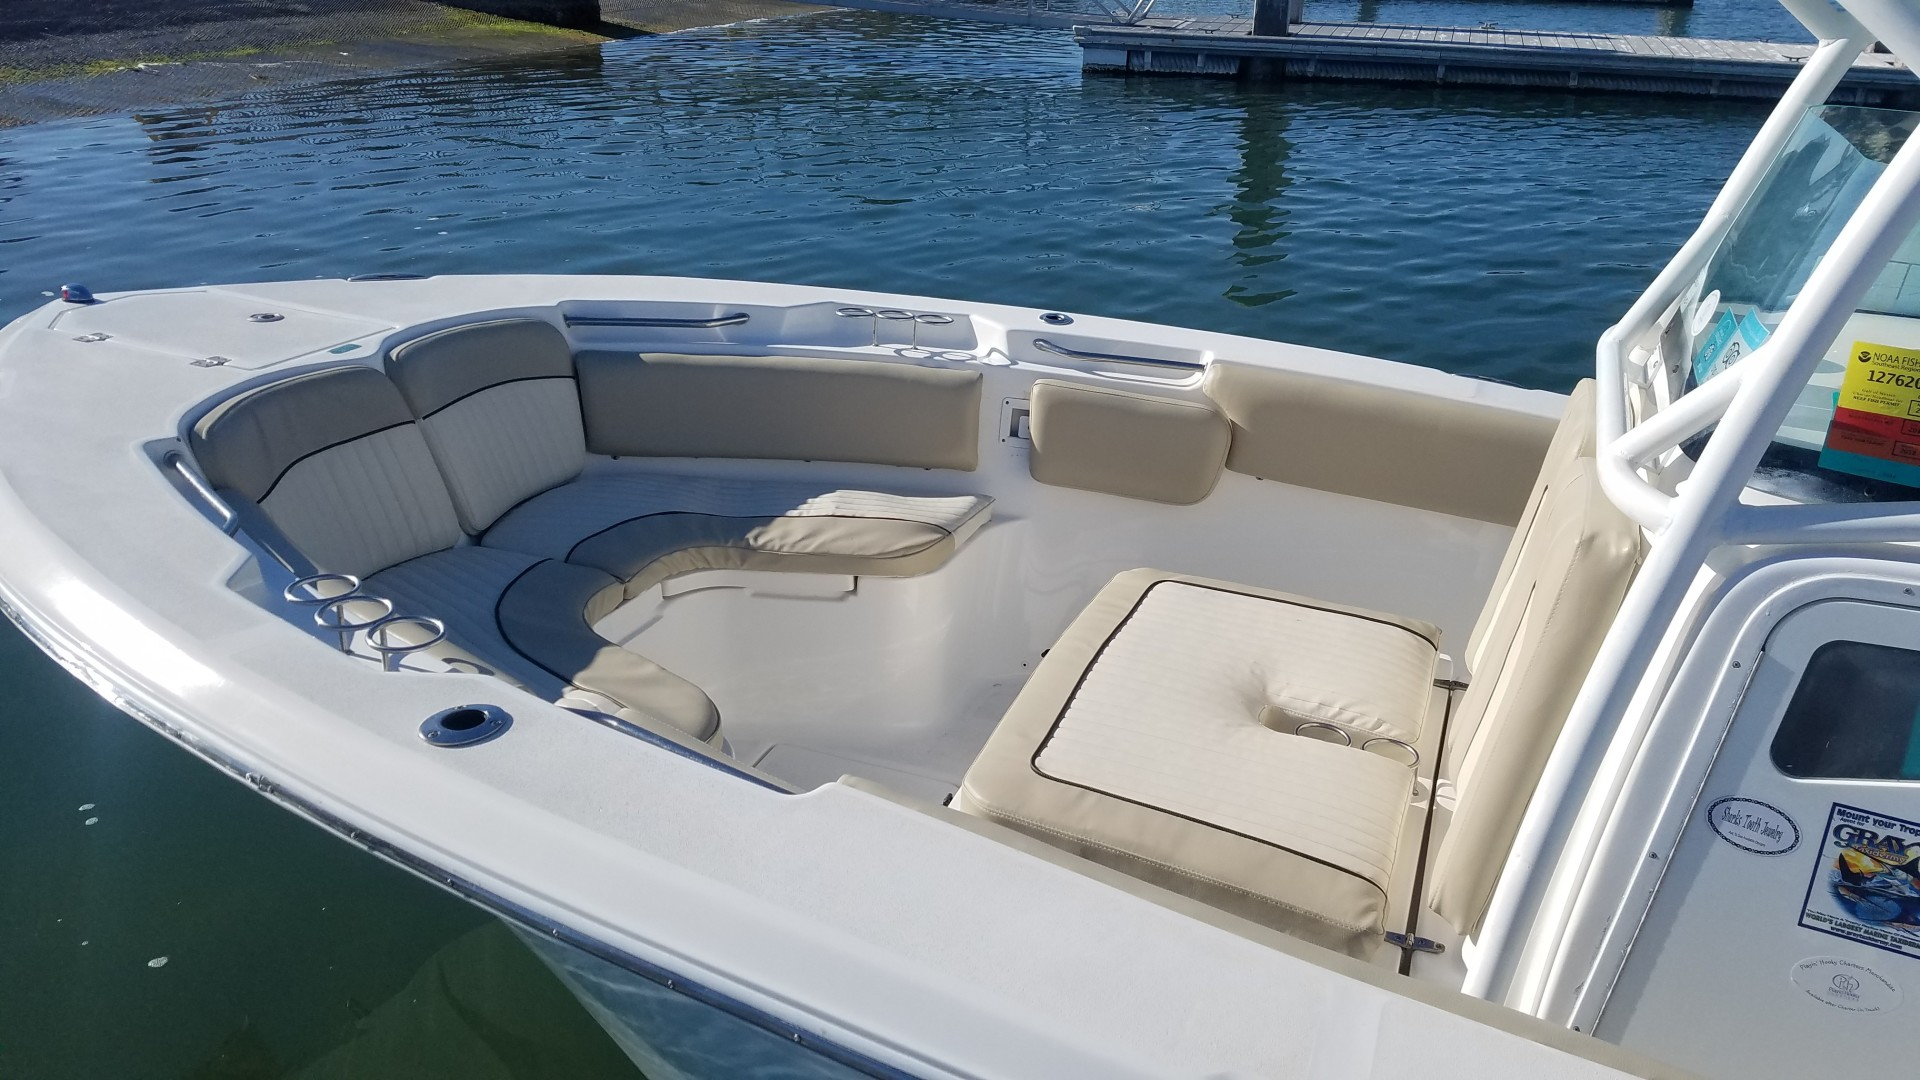 2015 Sea Foc 266 Commander_Bow Seating 2